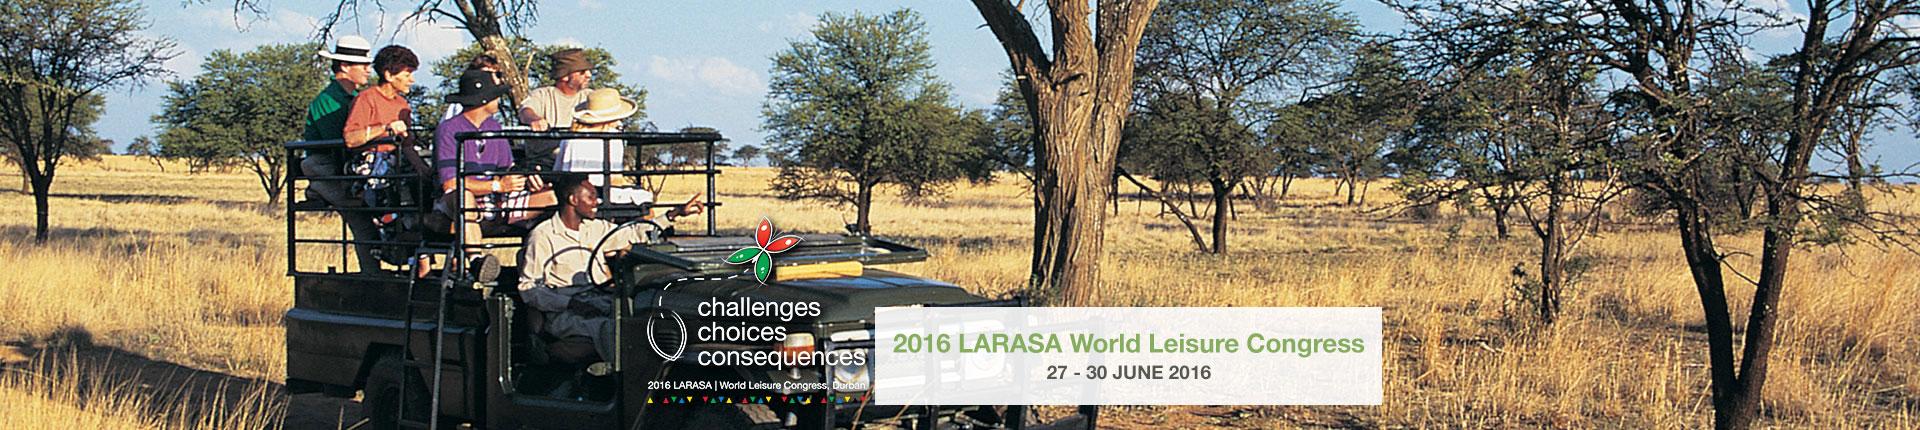 larasa-banners-8